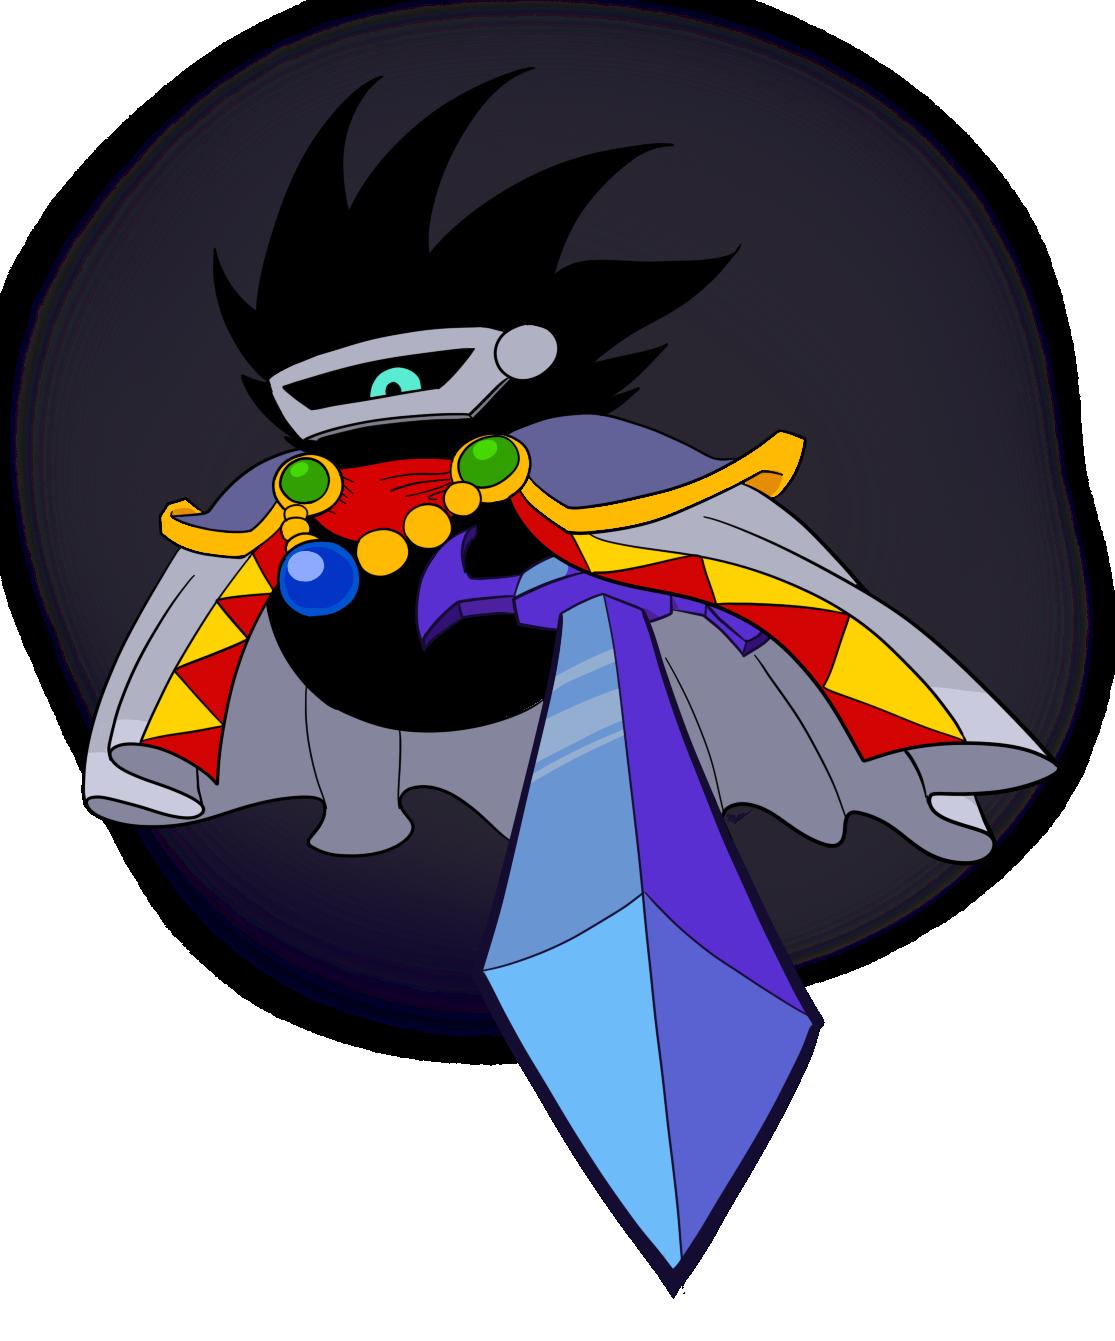 dark matter swordsman skylar - photo #13